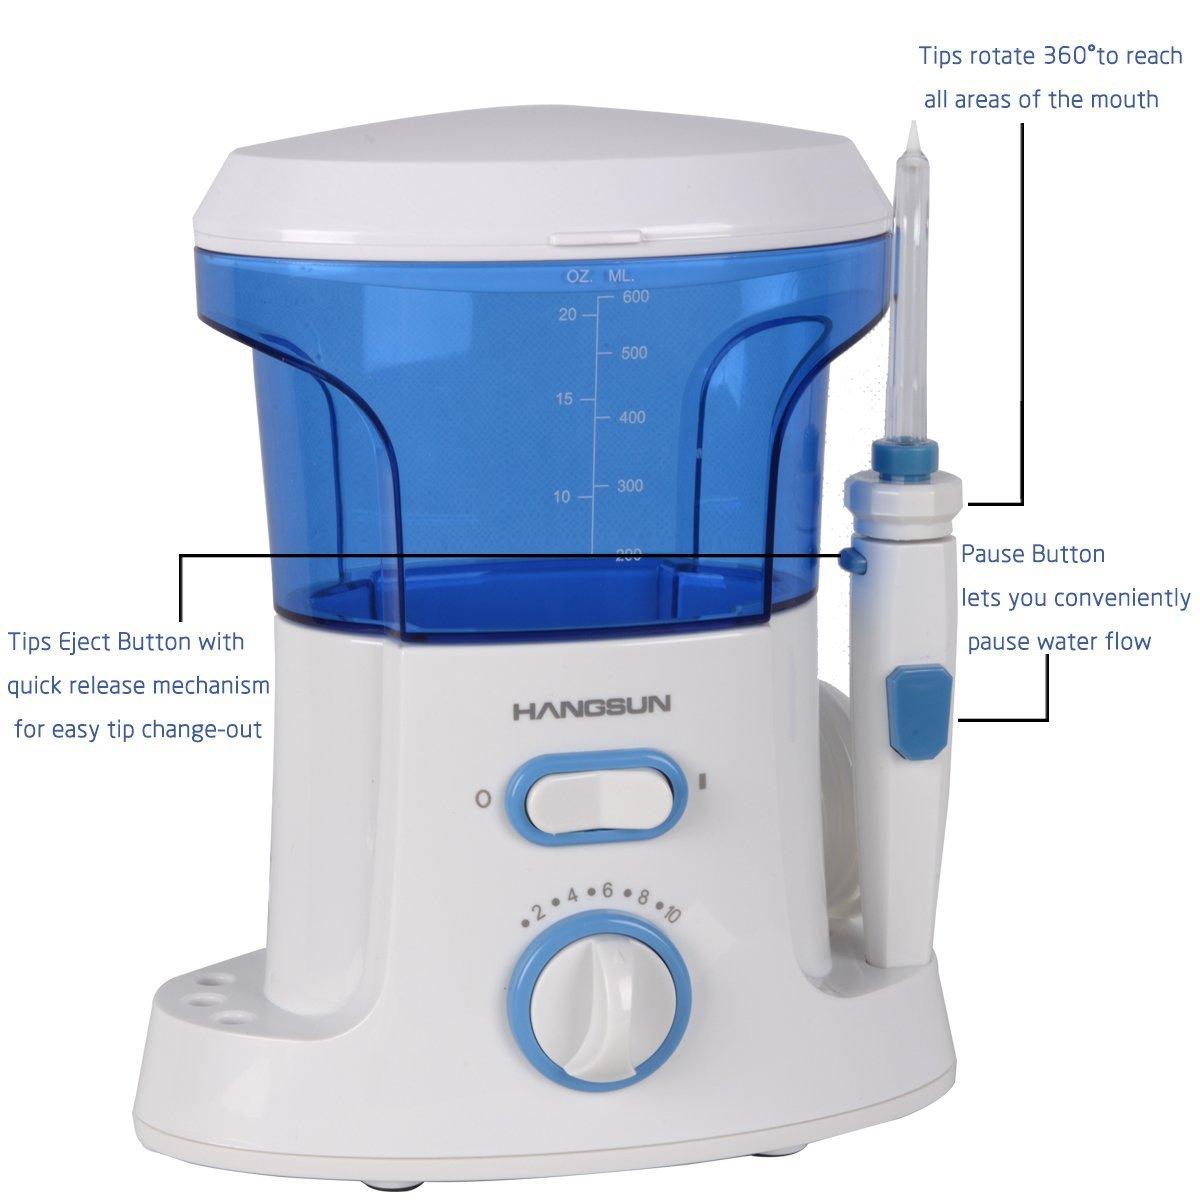 Limpiador Bucal HOC-200 Waterjet Dentacare de Hangsun por solo 49,99€